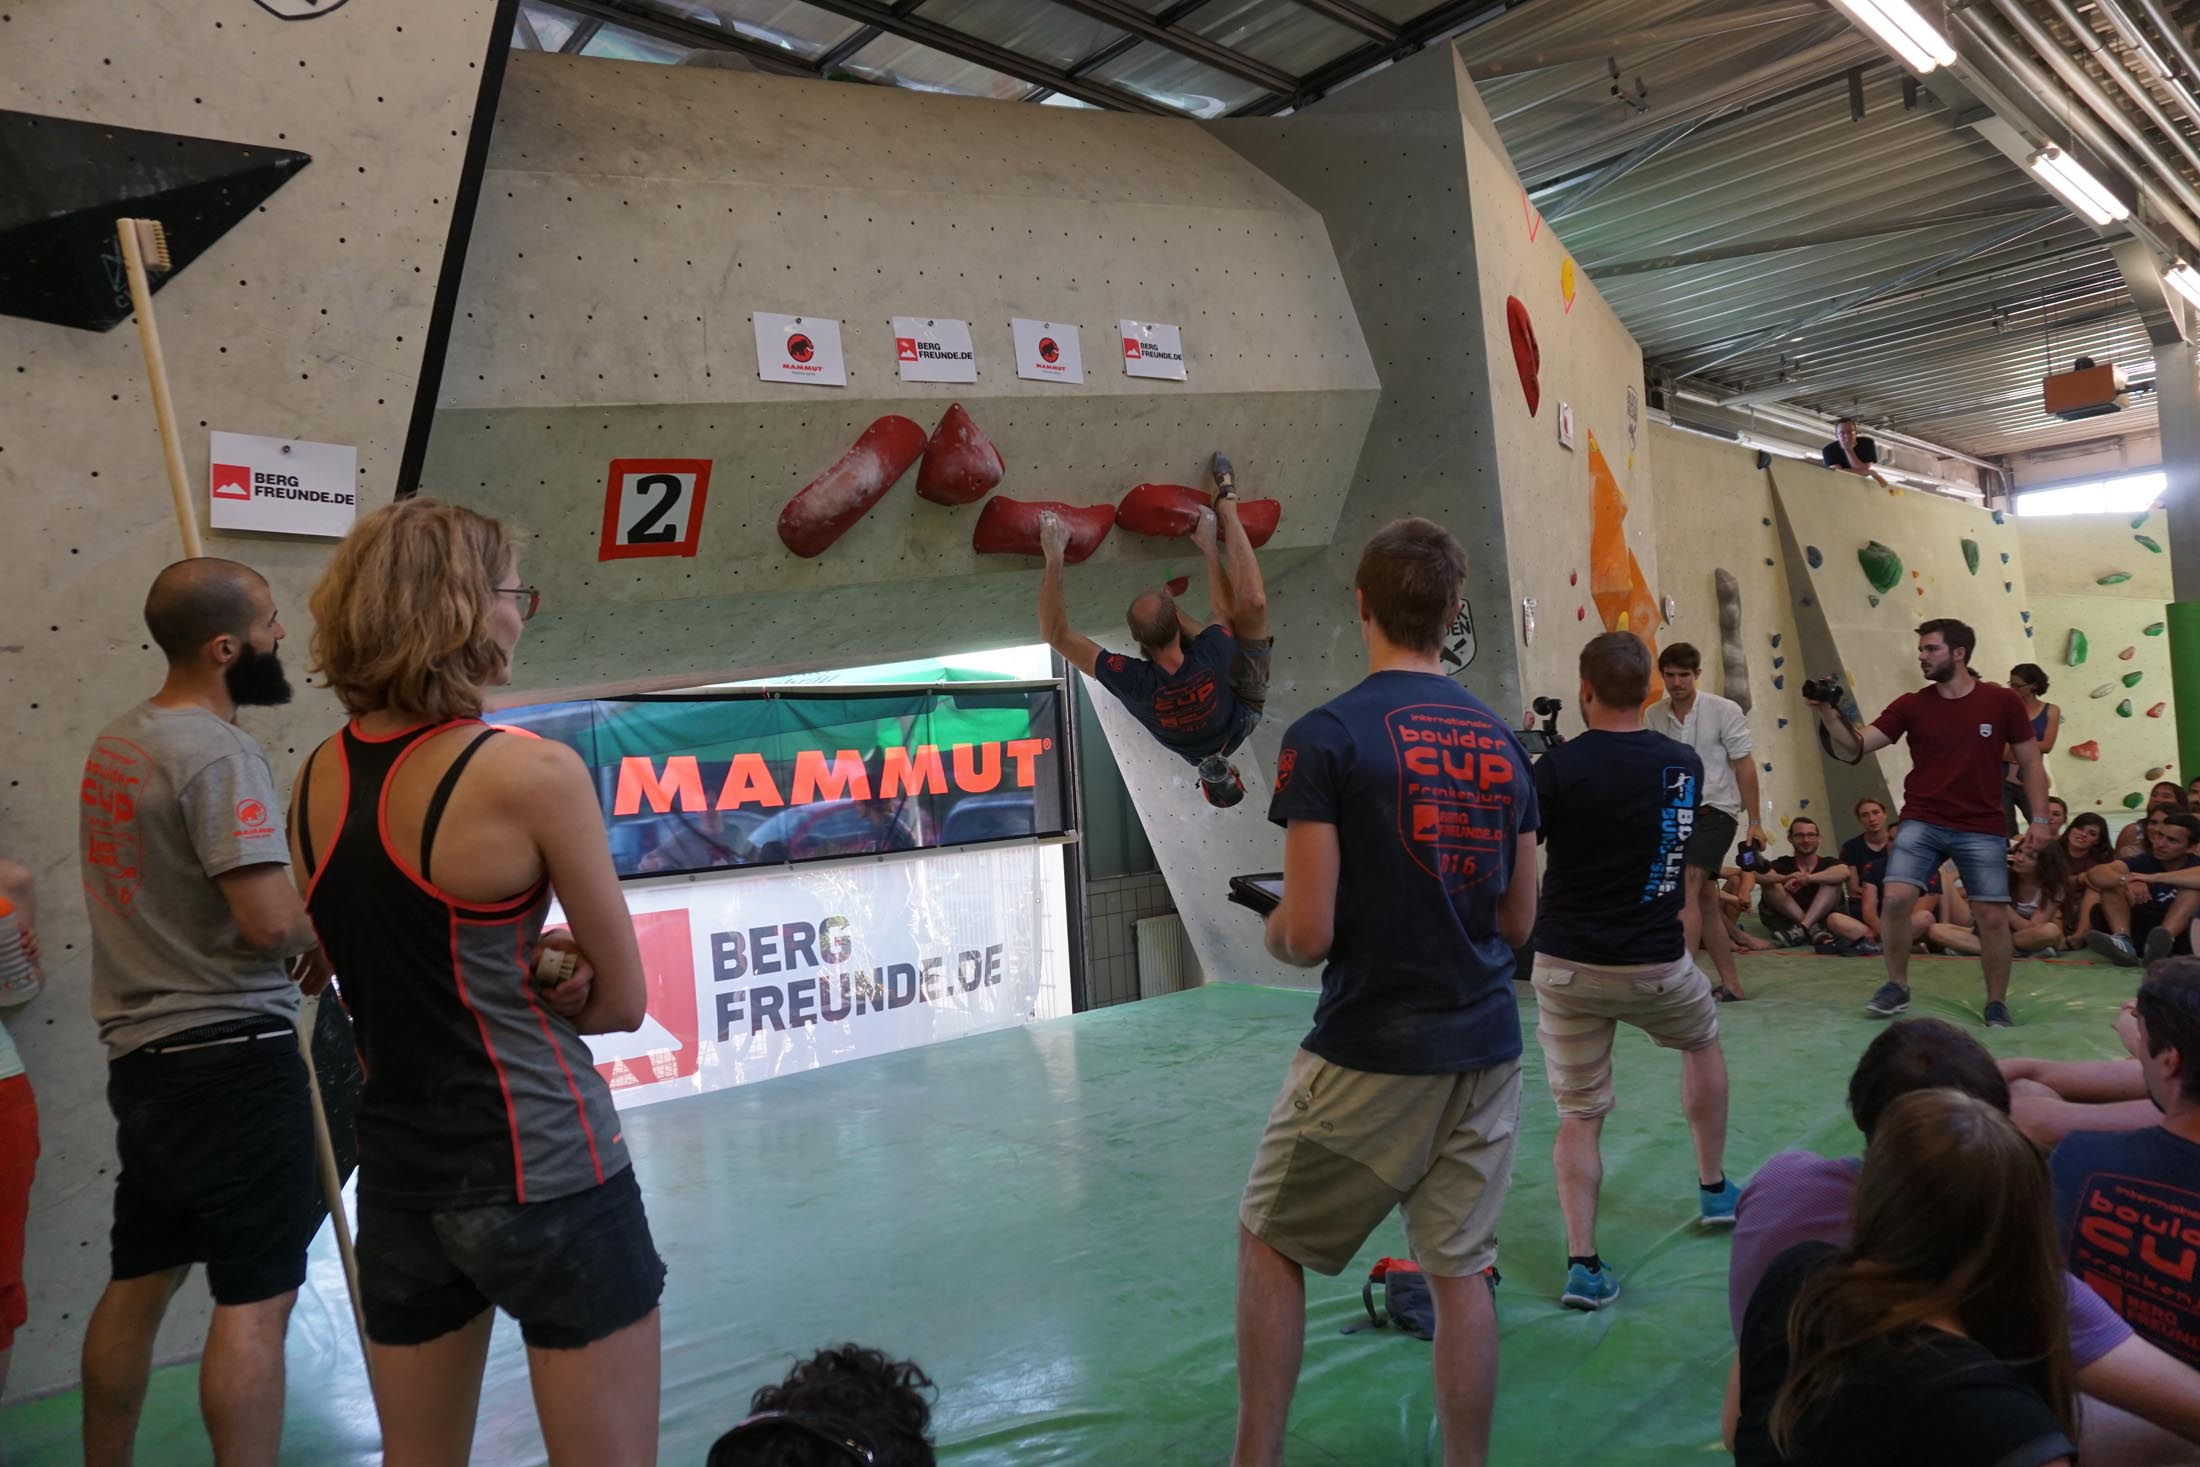 Finale, internationaler bouldercup Frankenjura 2016, BLOCKHELDEN Erlangen, Mammut, Bergfreunde.de, Boulderwettkampf07092016590